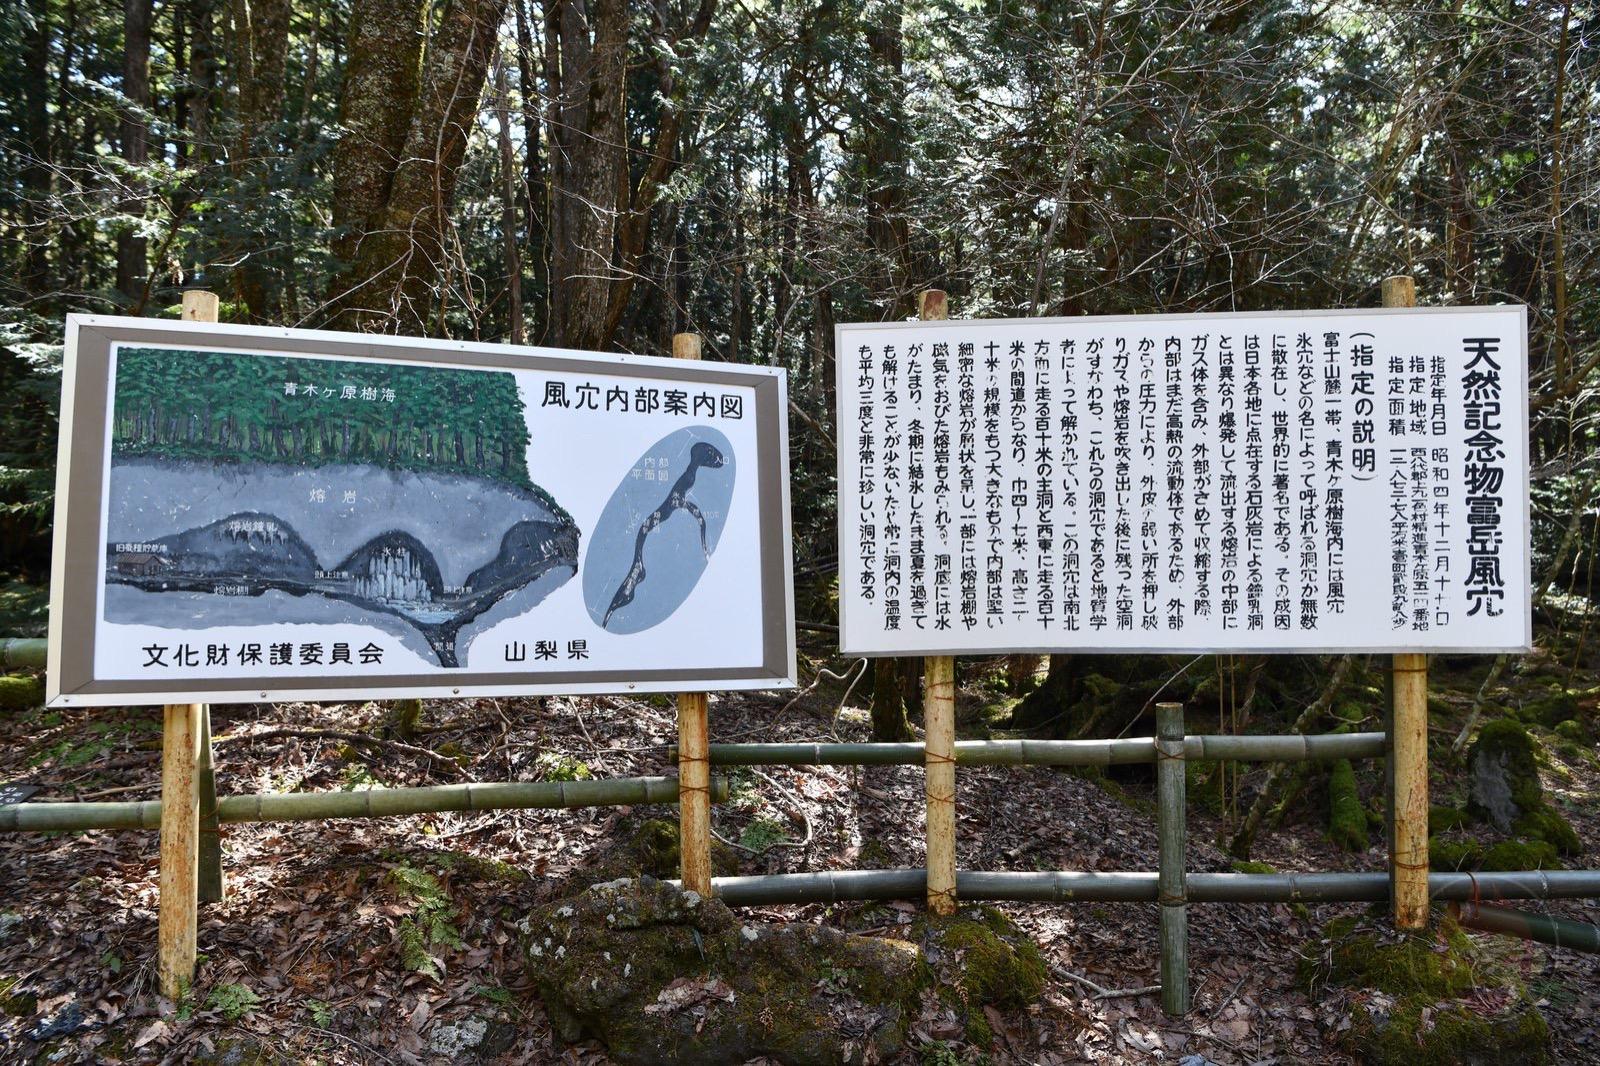 Narusawa-Hyouketsu-and-Tomidake-Fuuketu-JTC21-43.jpg